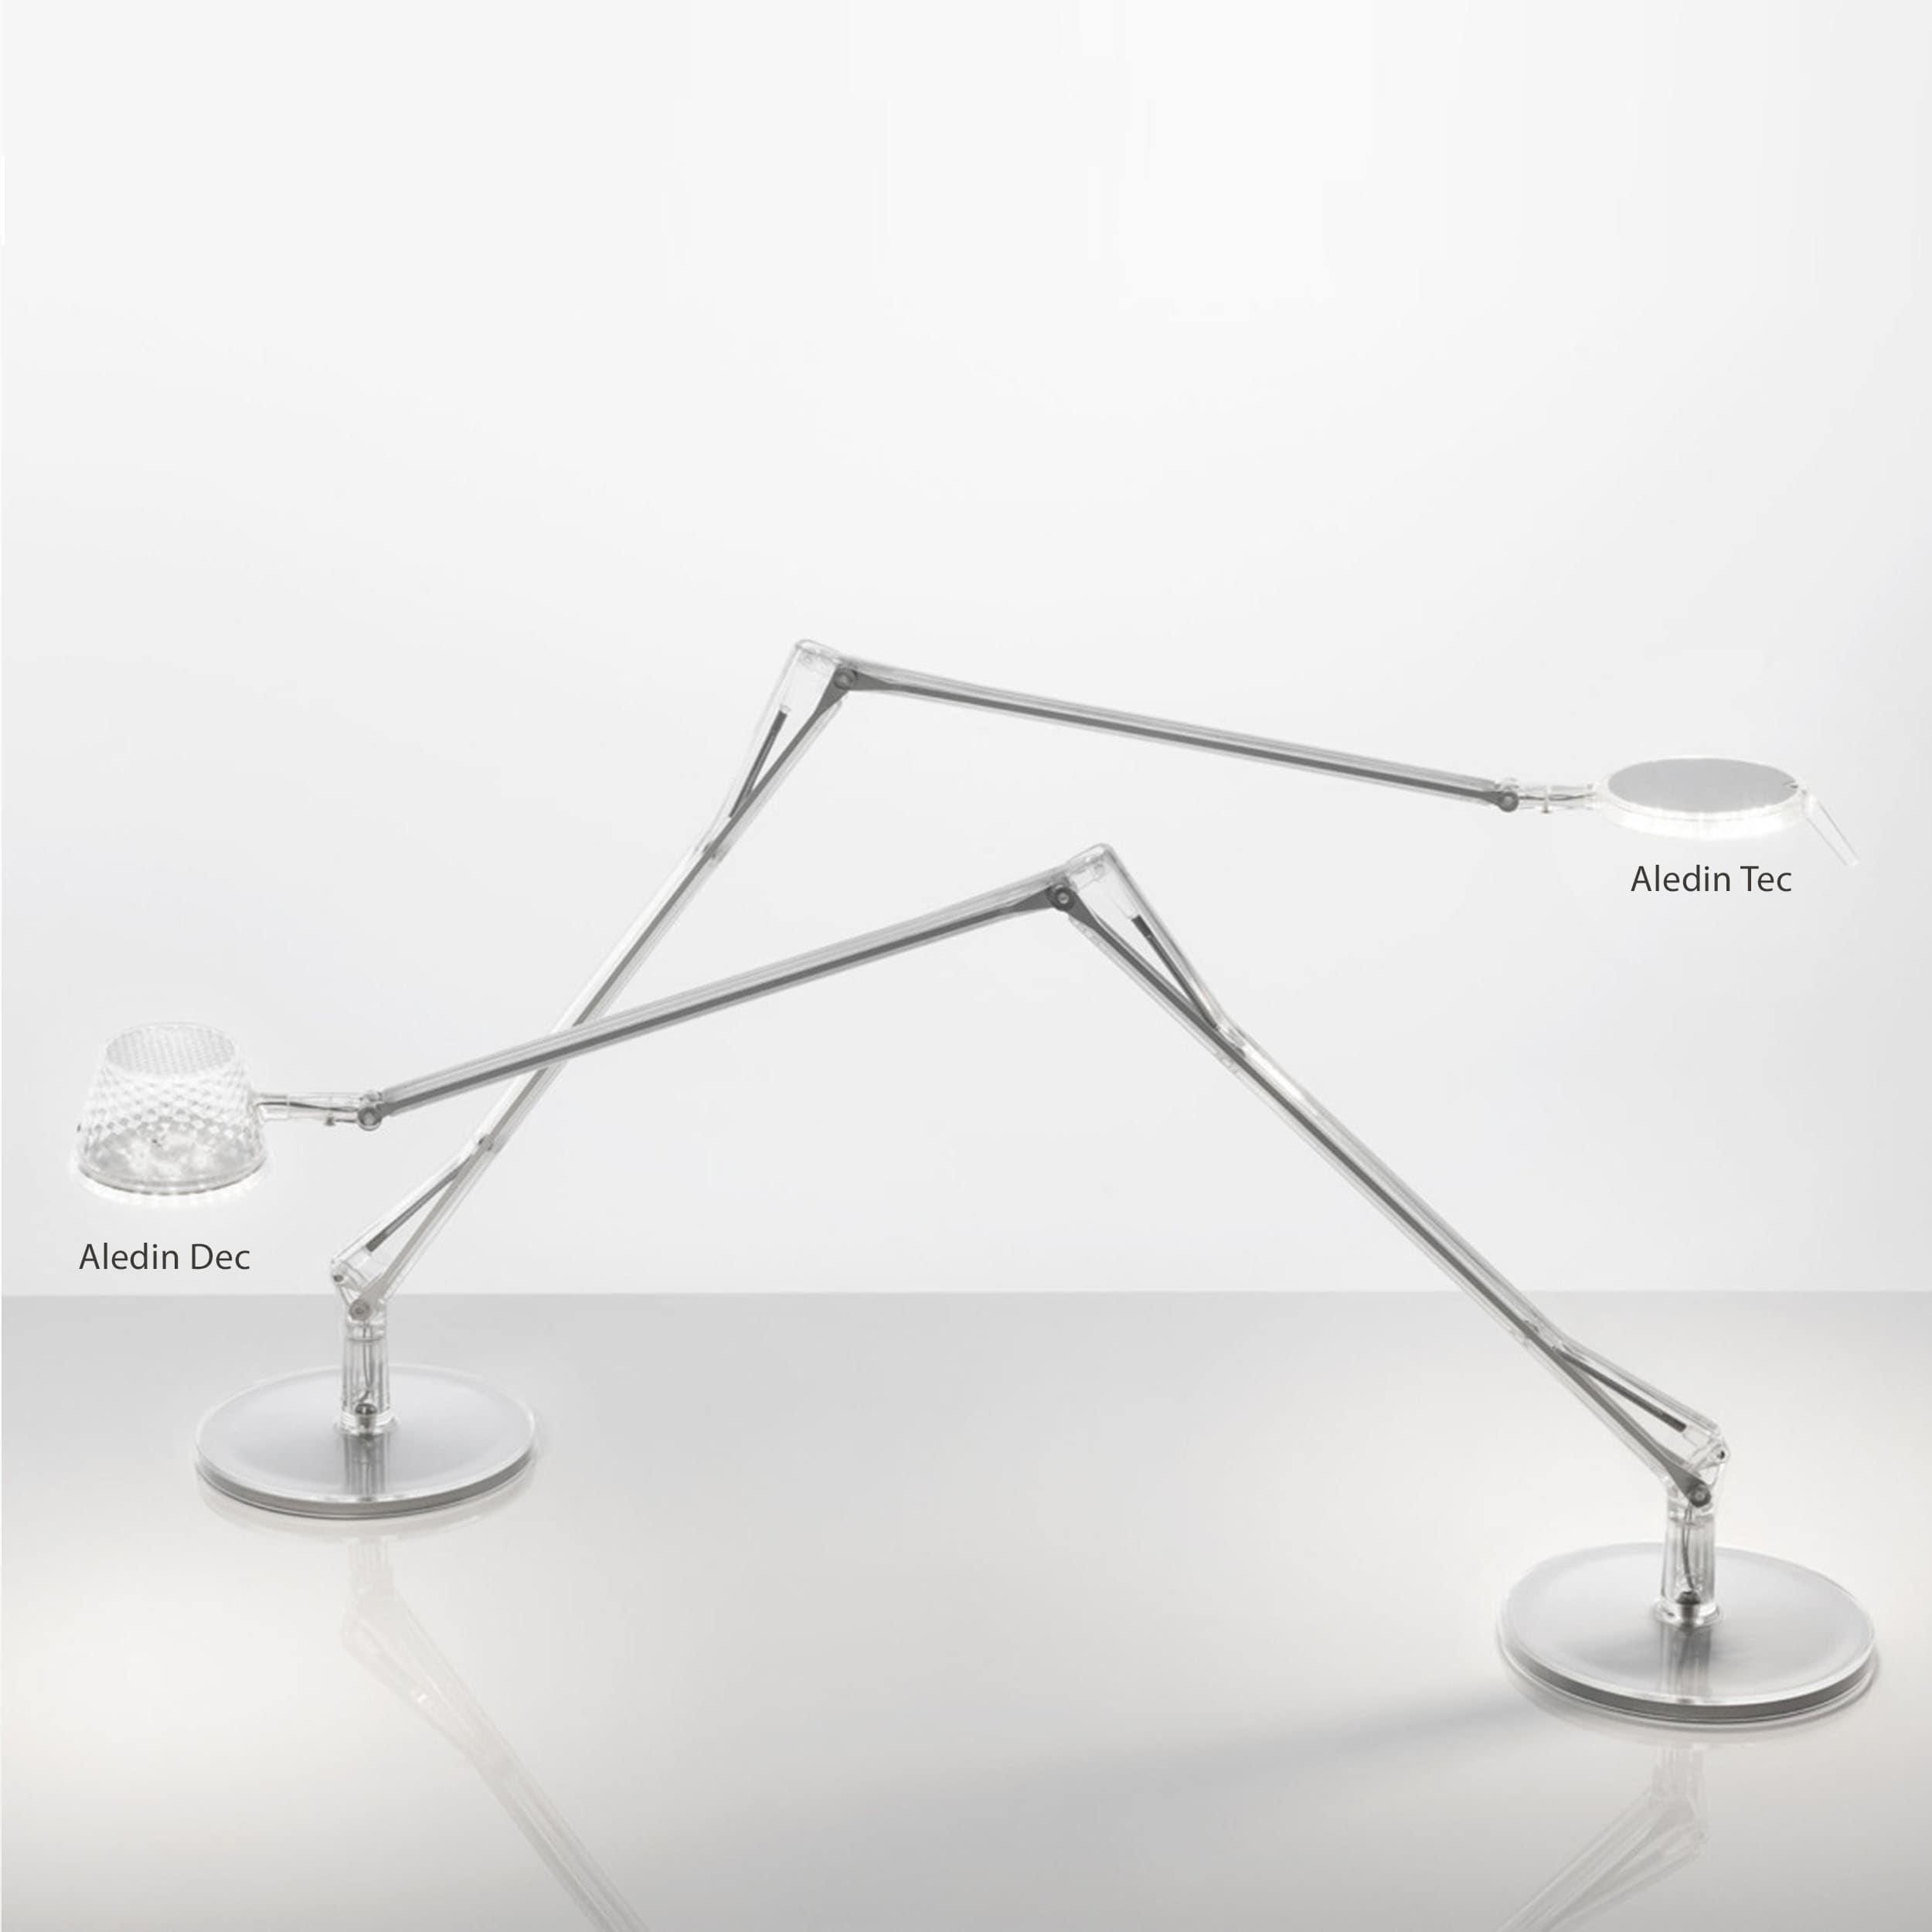 Aledin Dec LED Tischleuchte